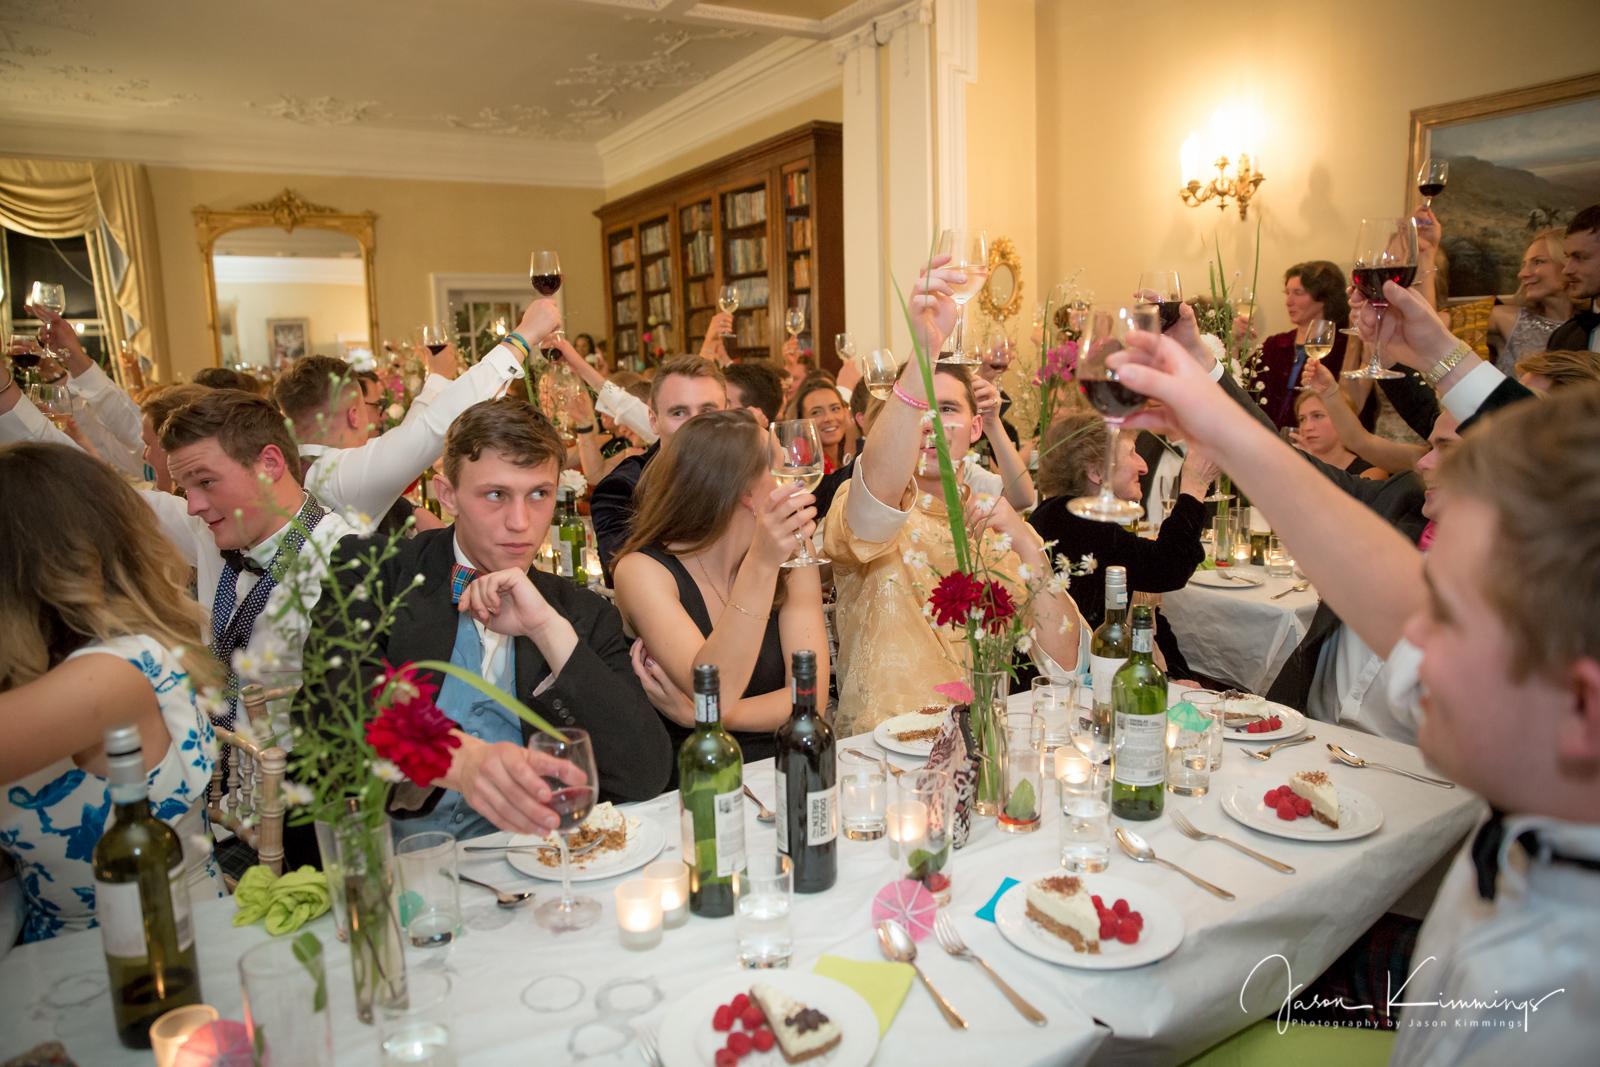 Party-event-photography-west-lothian-edinburgh-glasgow-18.jpg